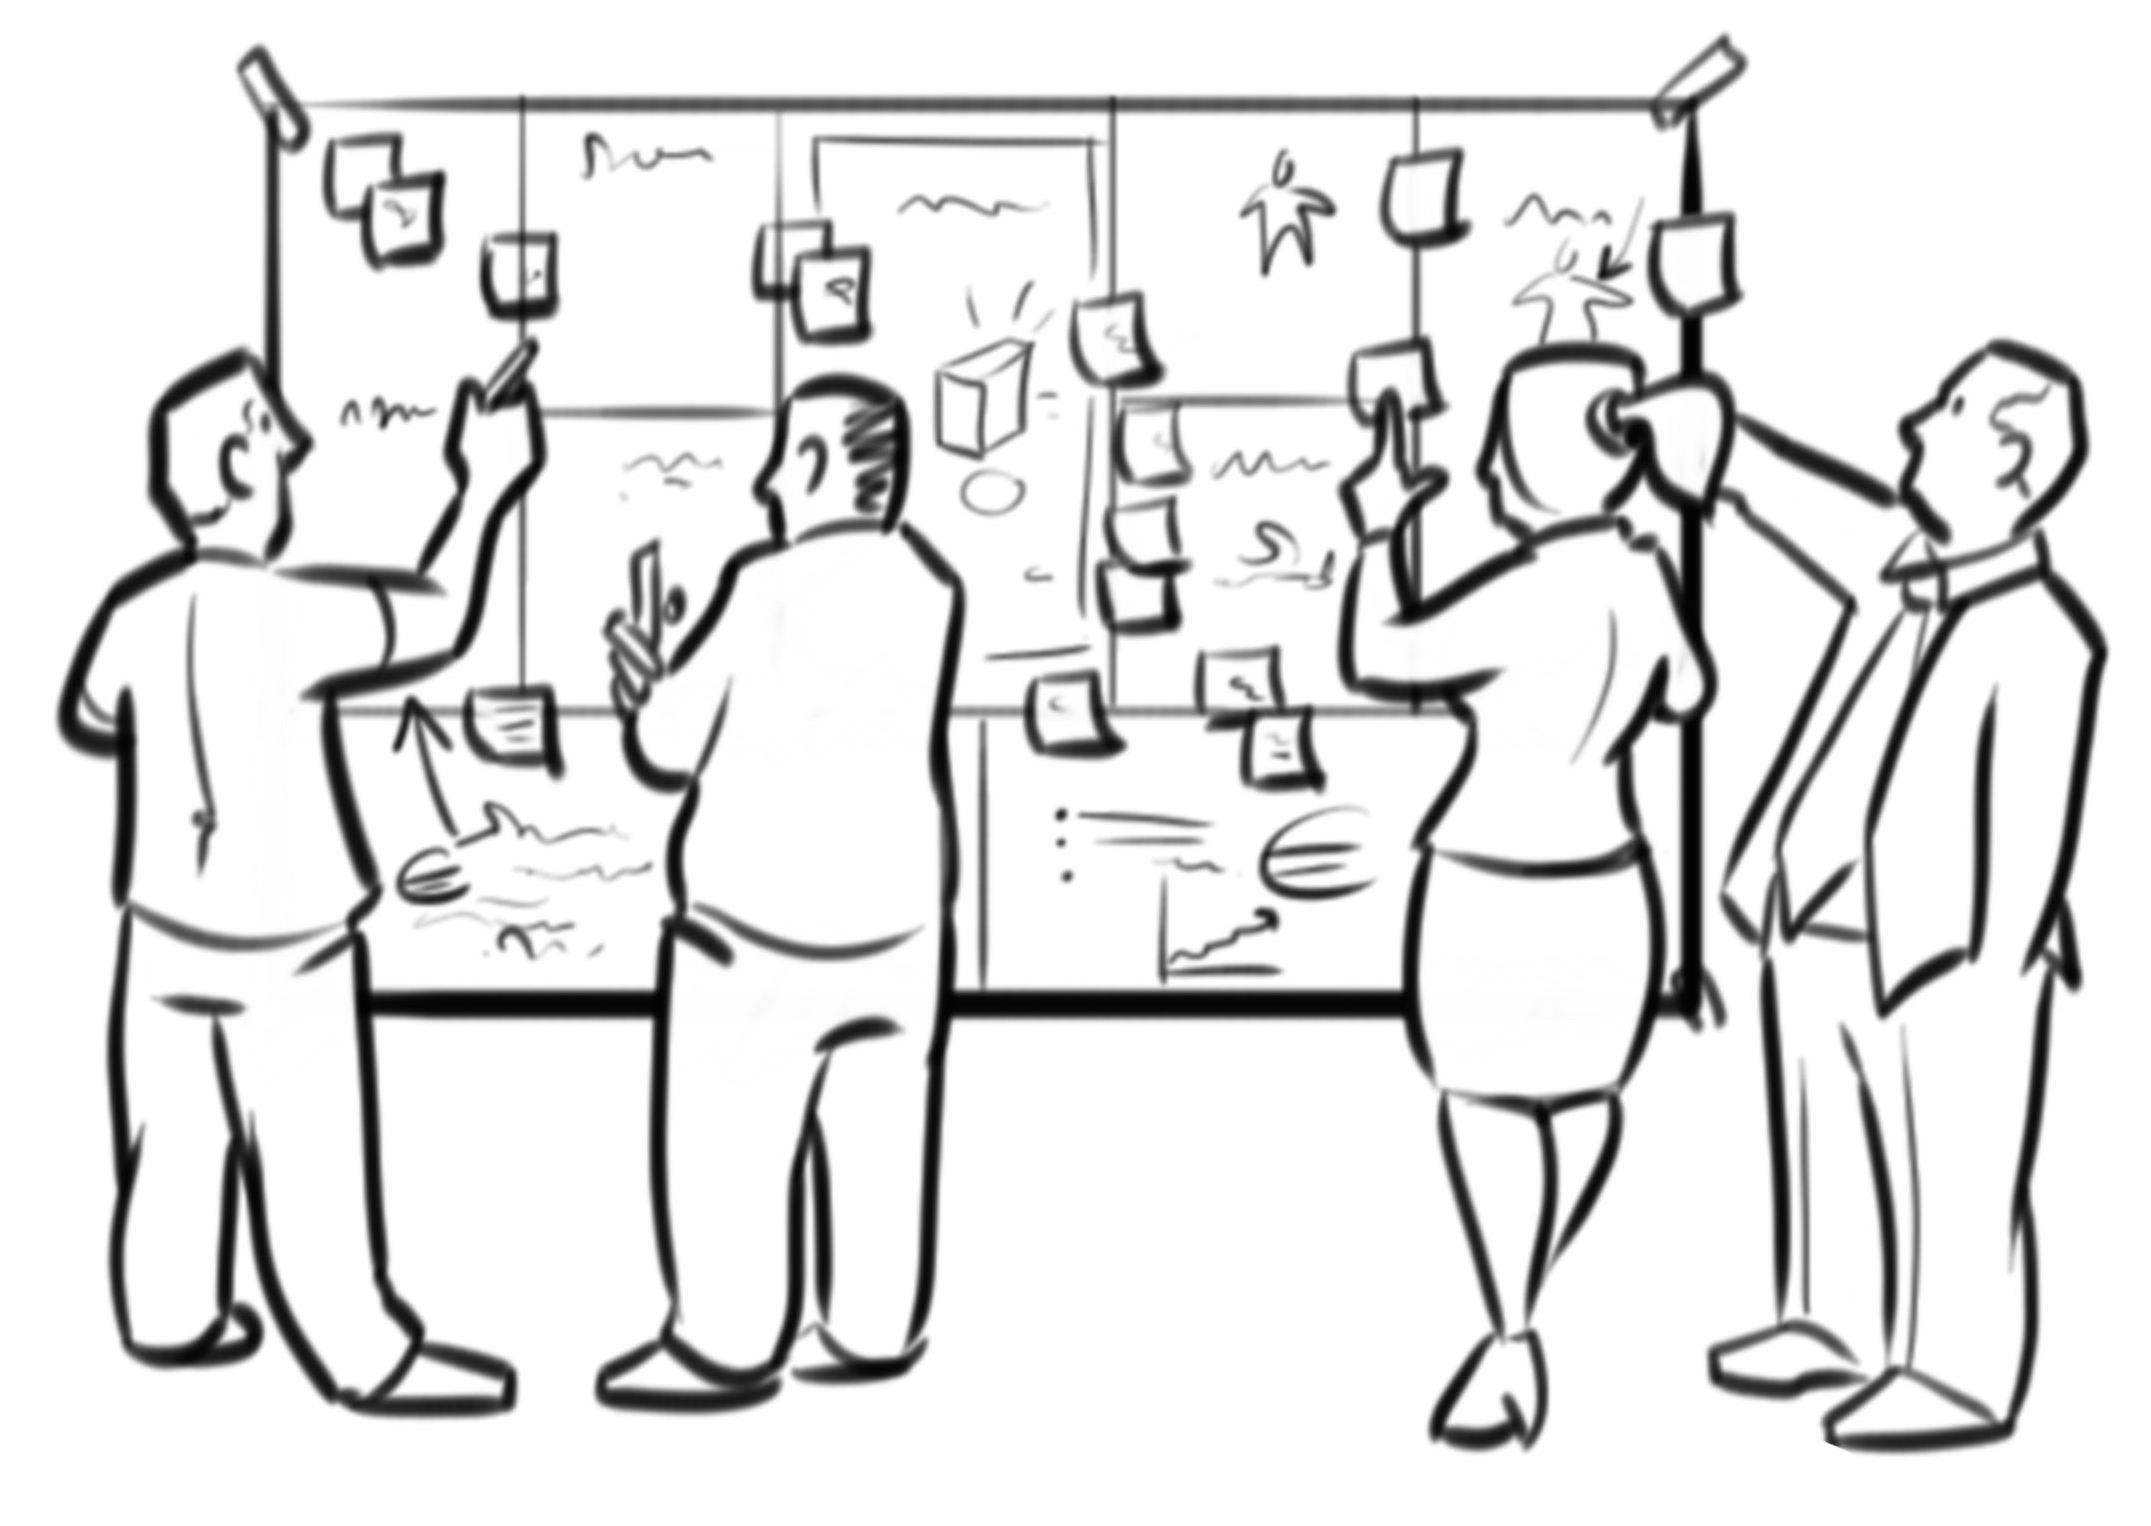 IT Business Model Canvas